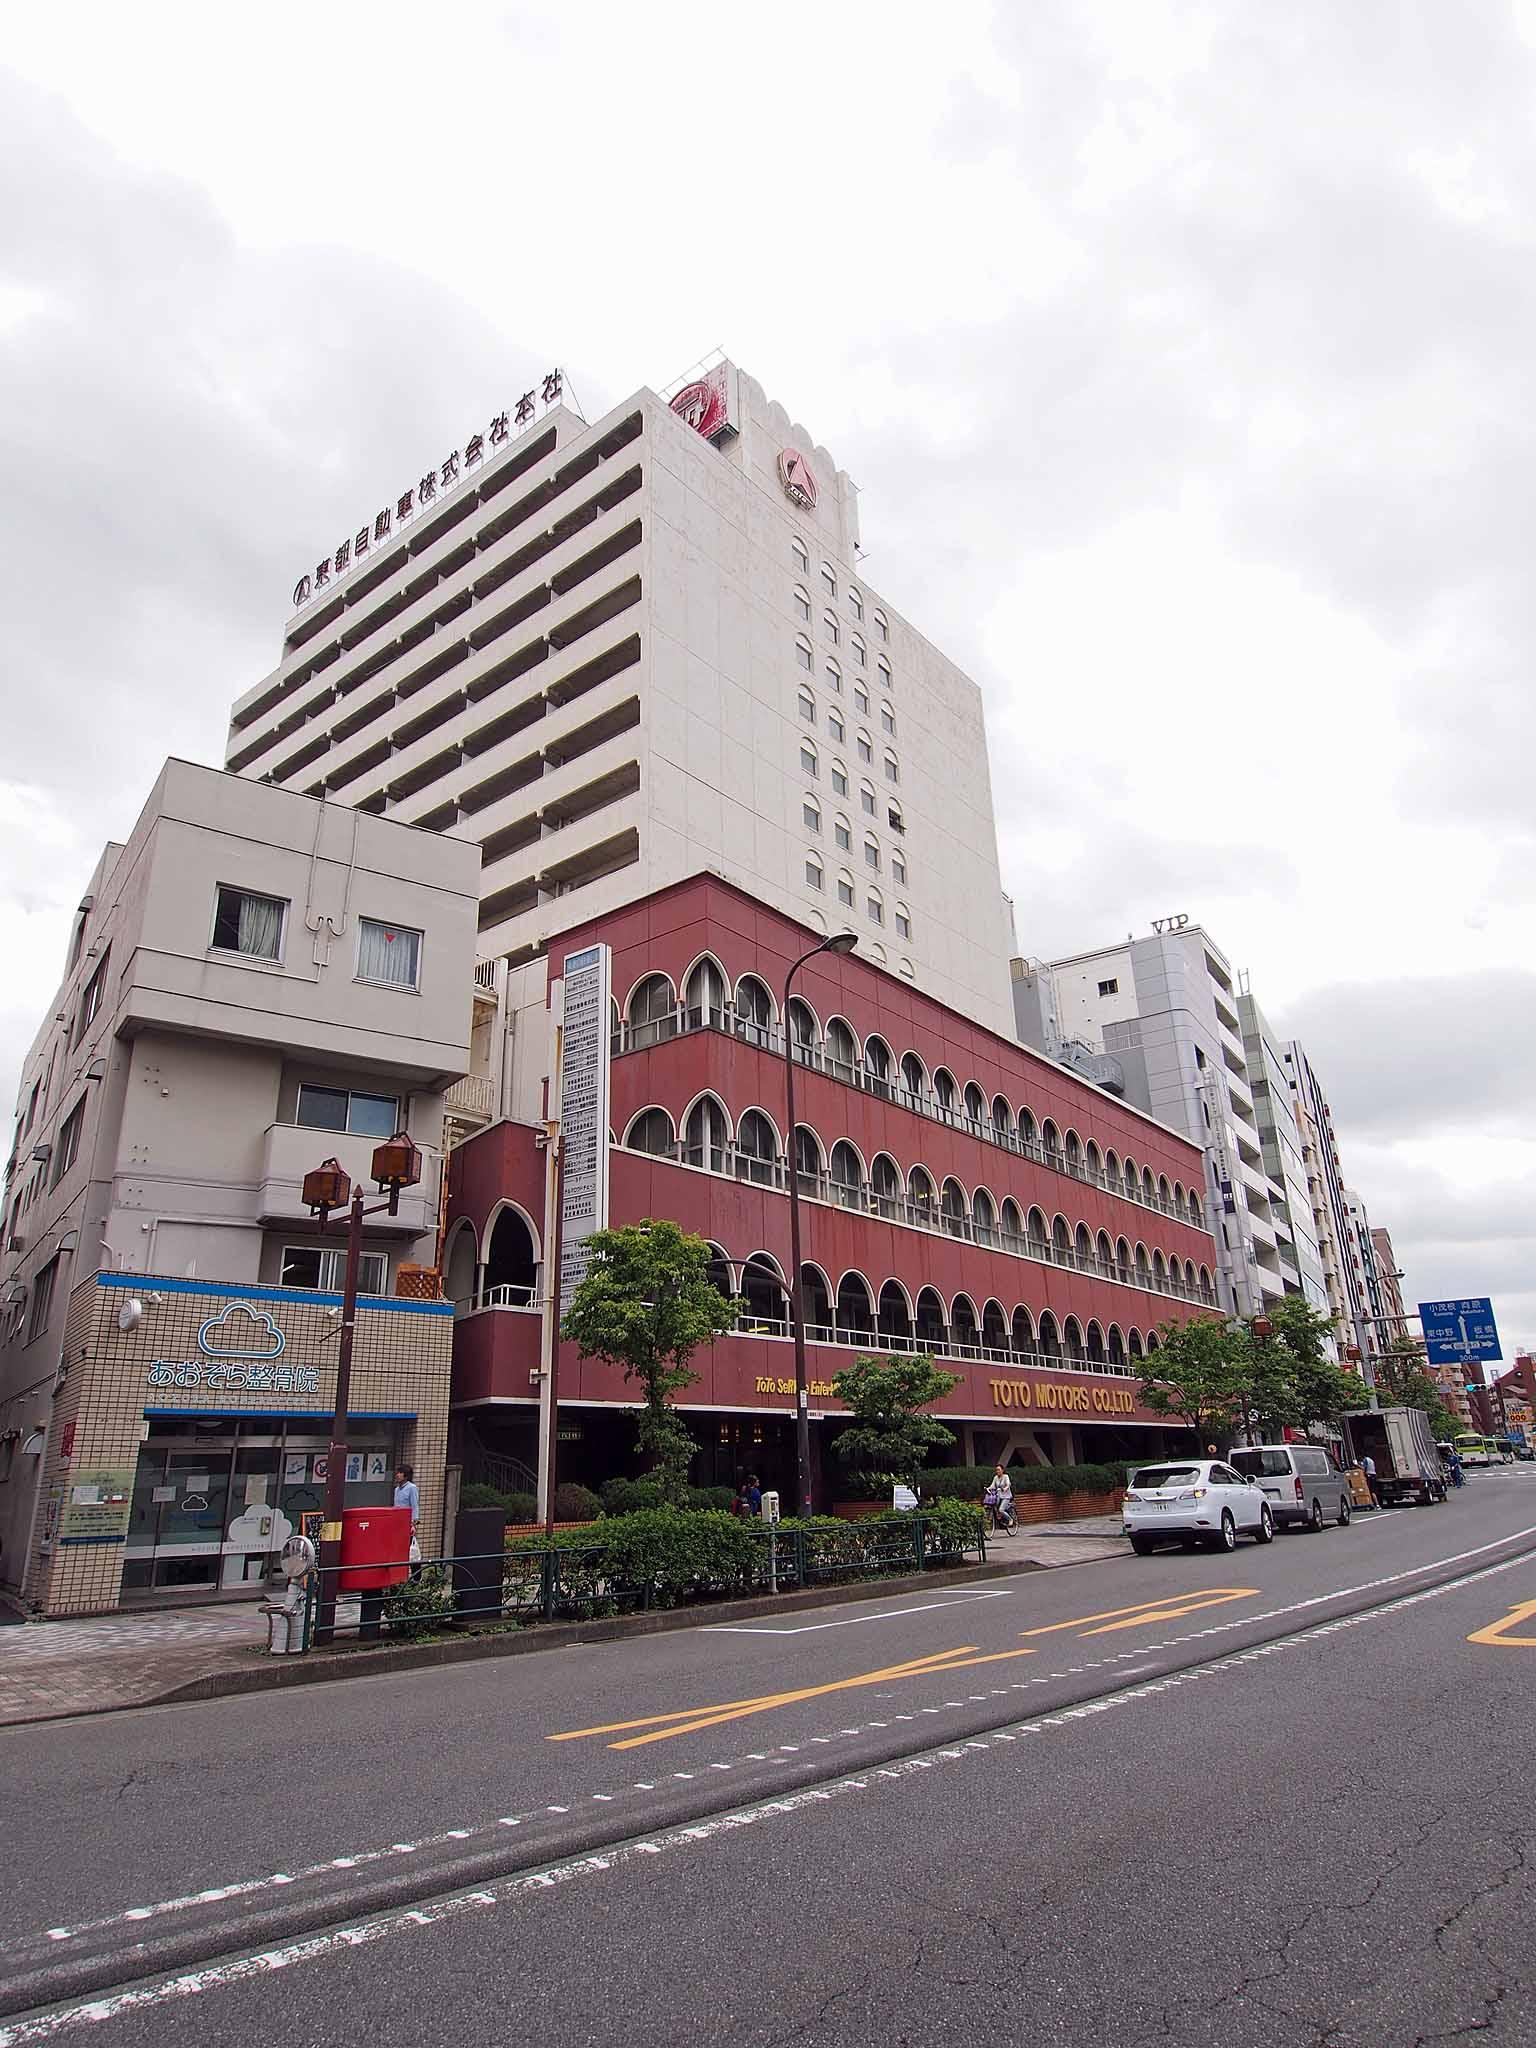 File:Toto Motors Group Head Office Building 2016.jpg - Wikimedia Commons